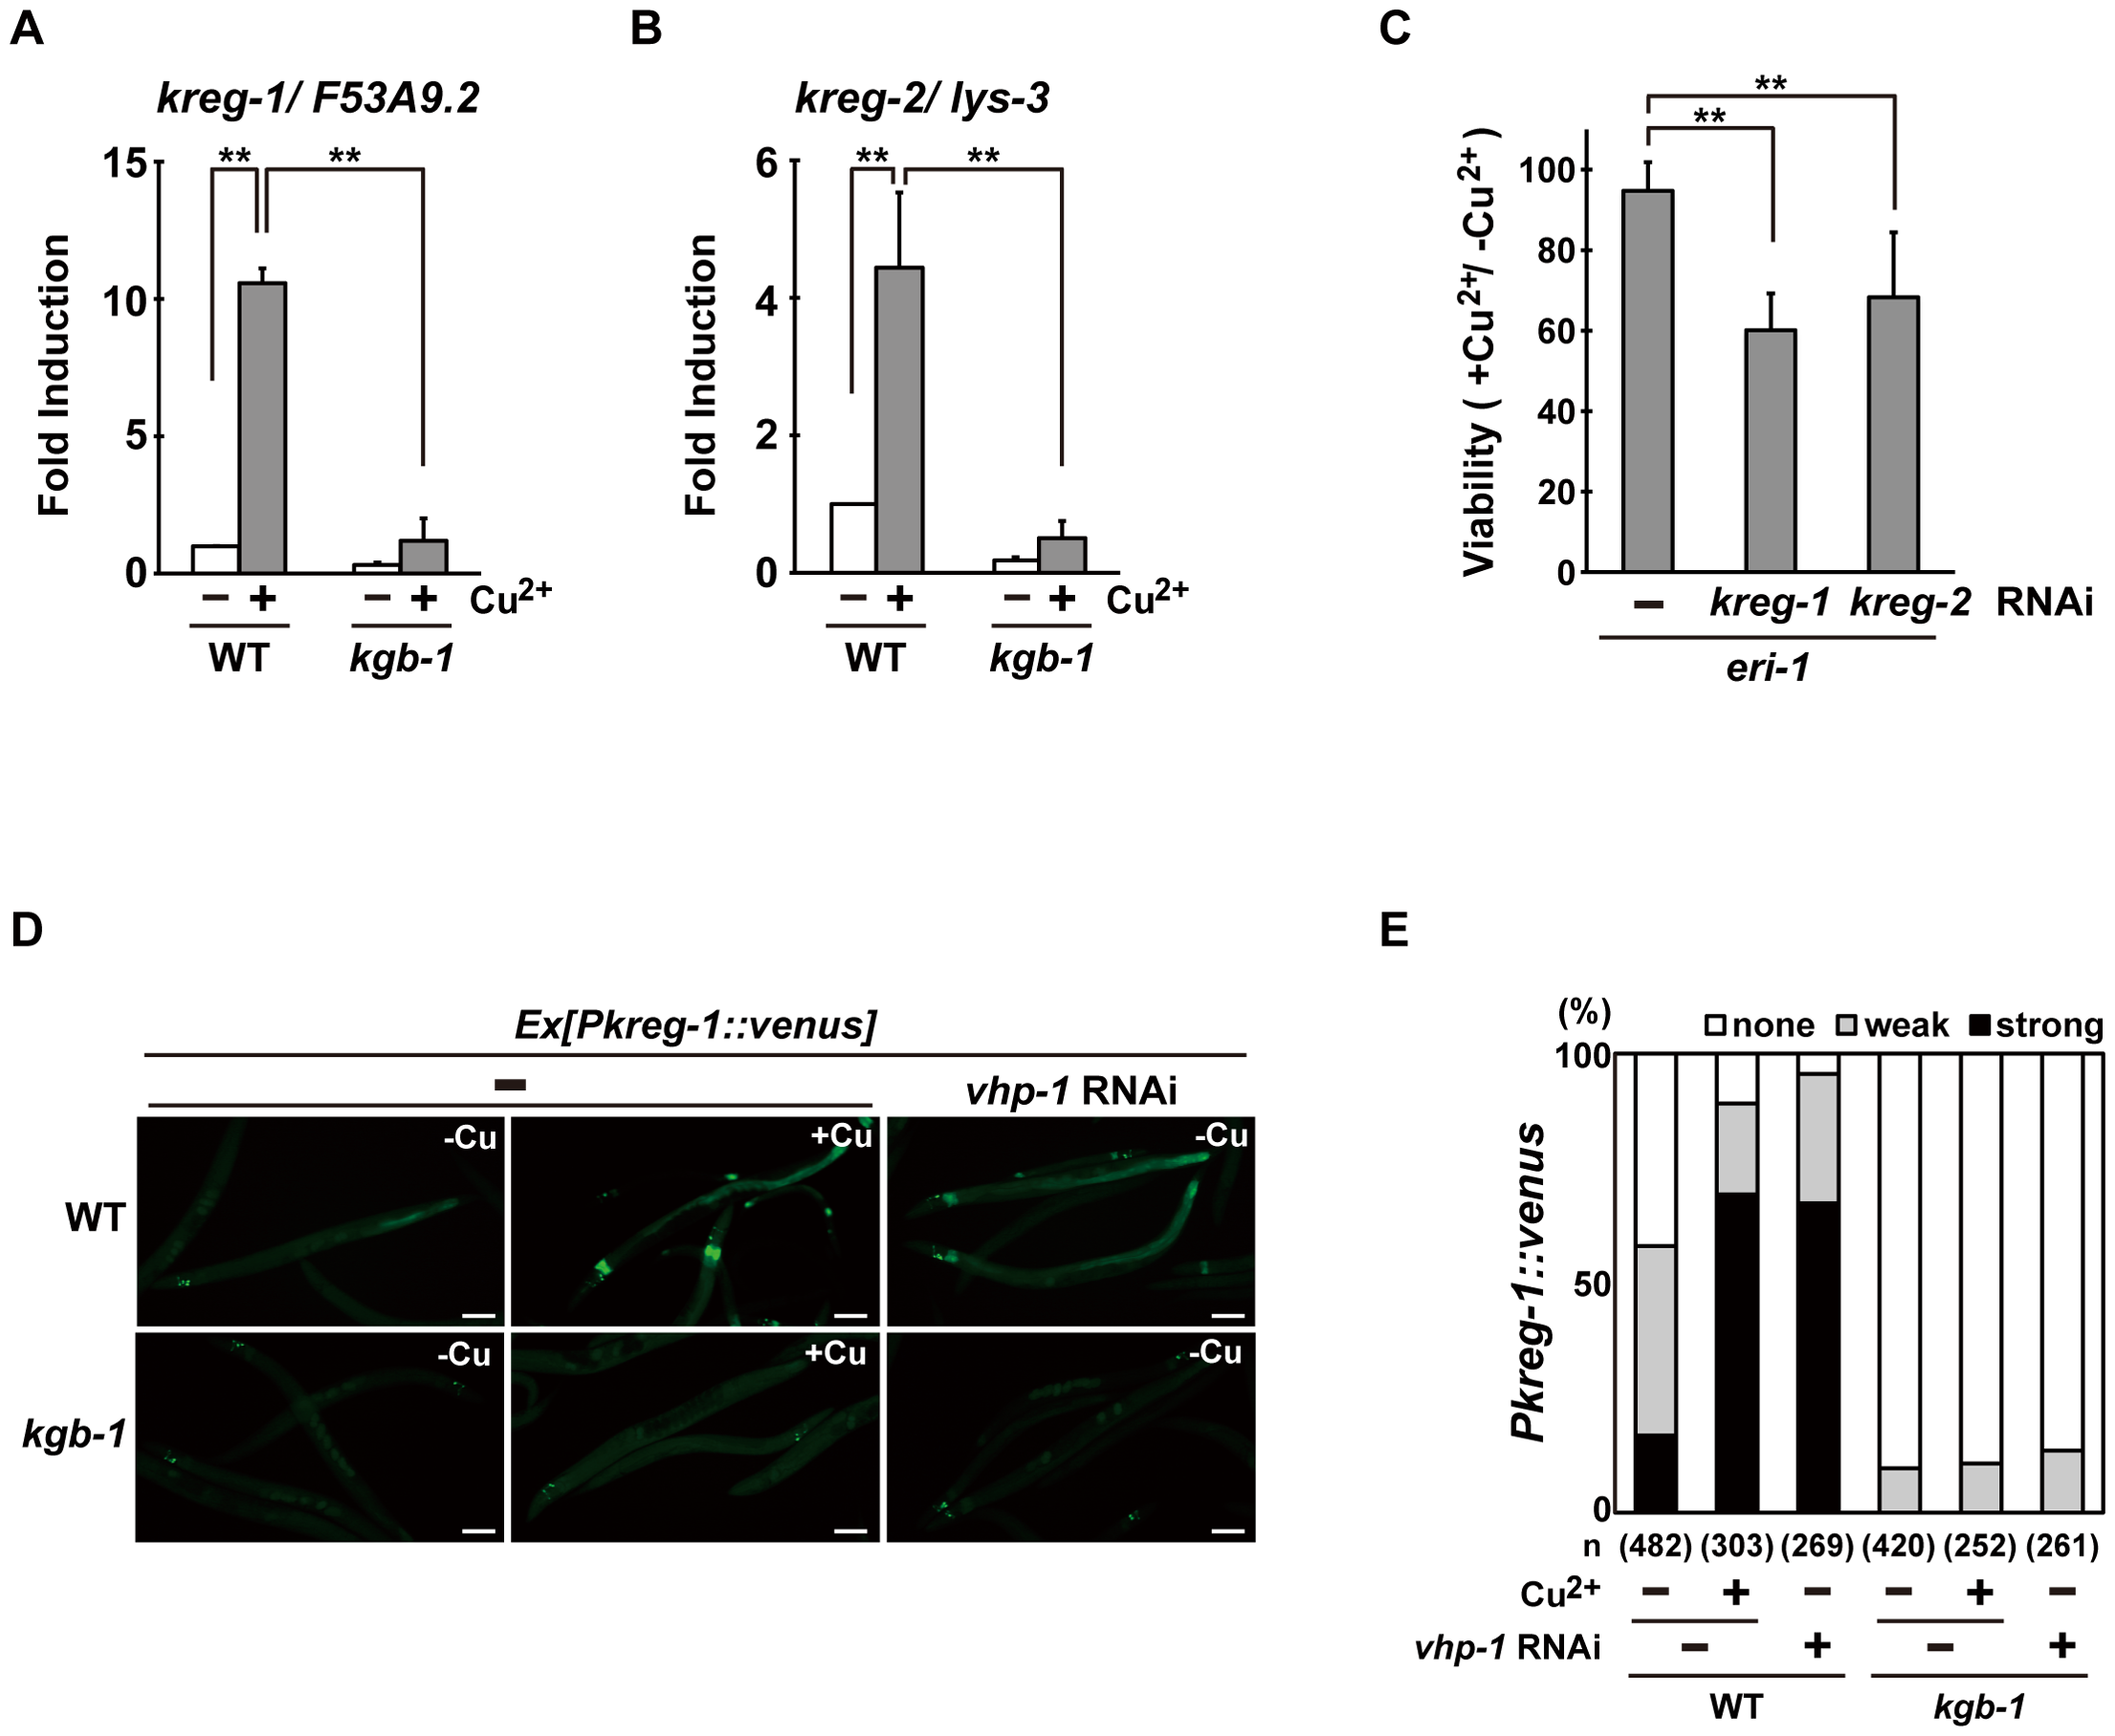 The KGB-1 pathway regulates expression of <i>kreg</i> genes.